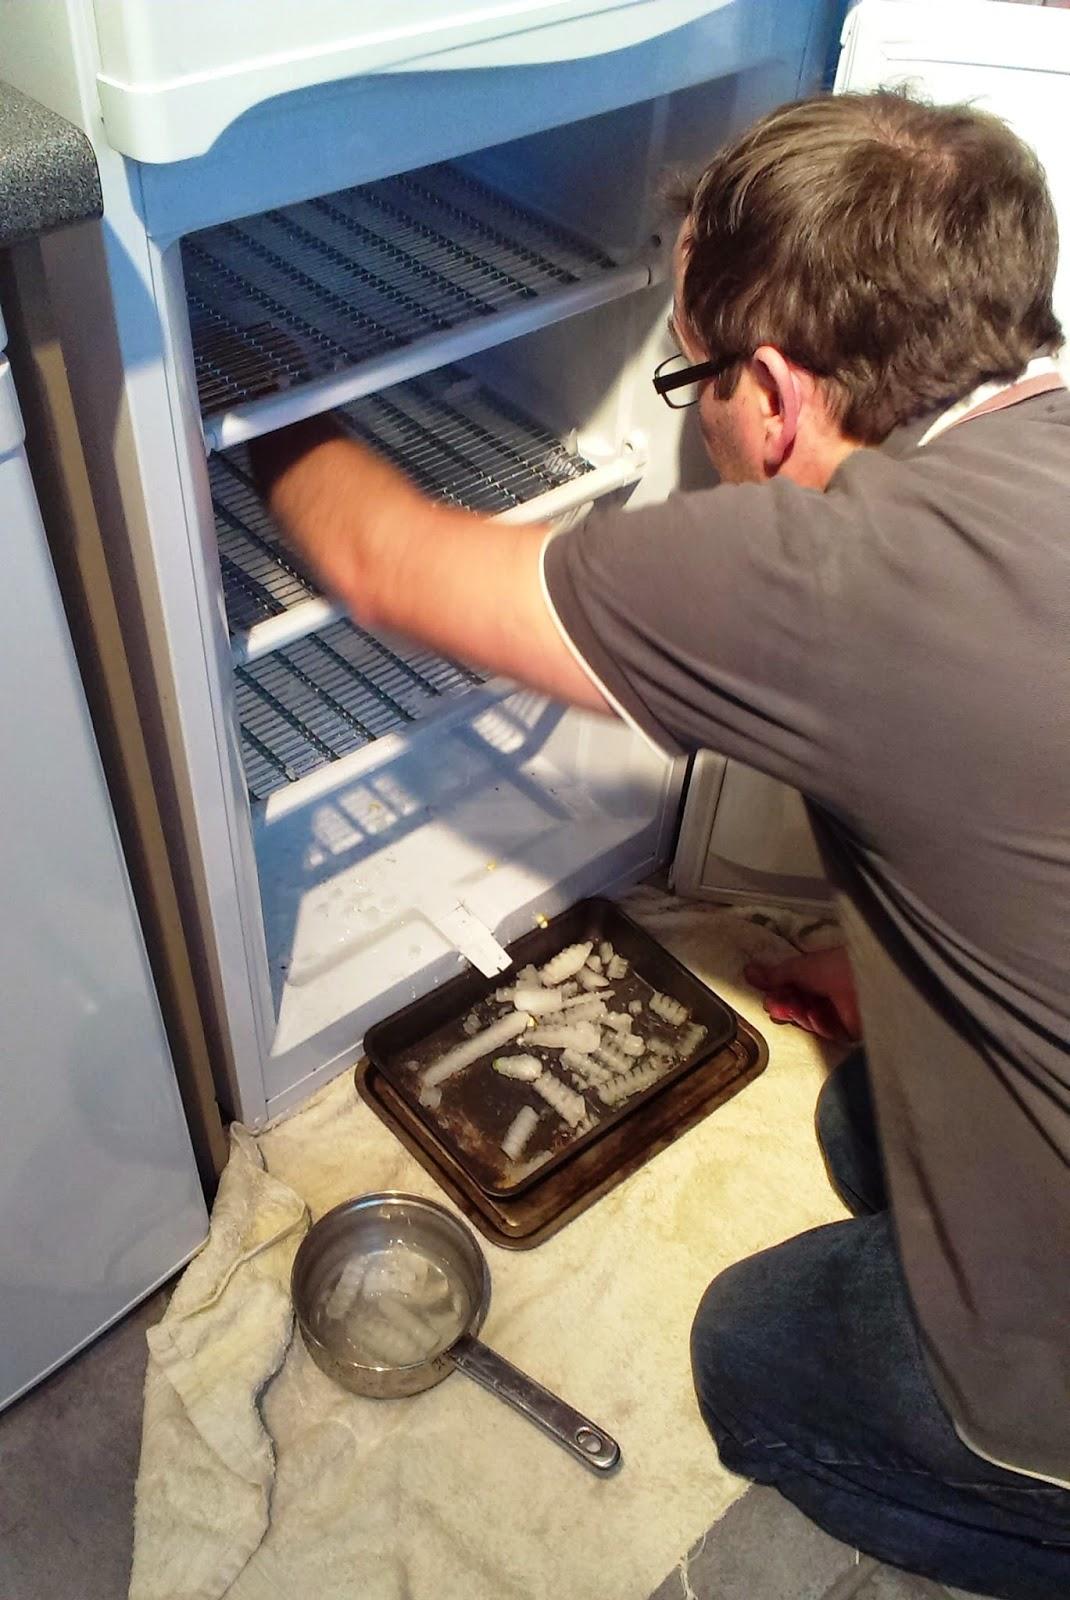 Defrosting a freezer